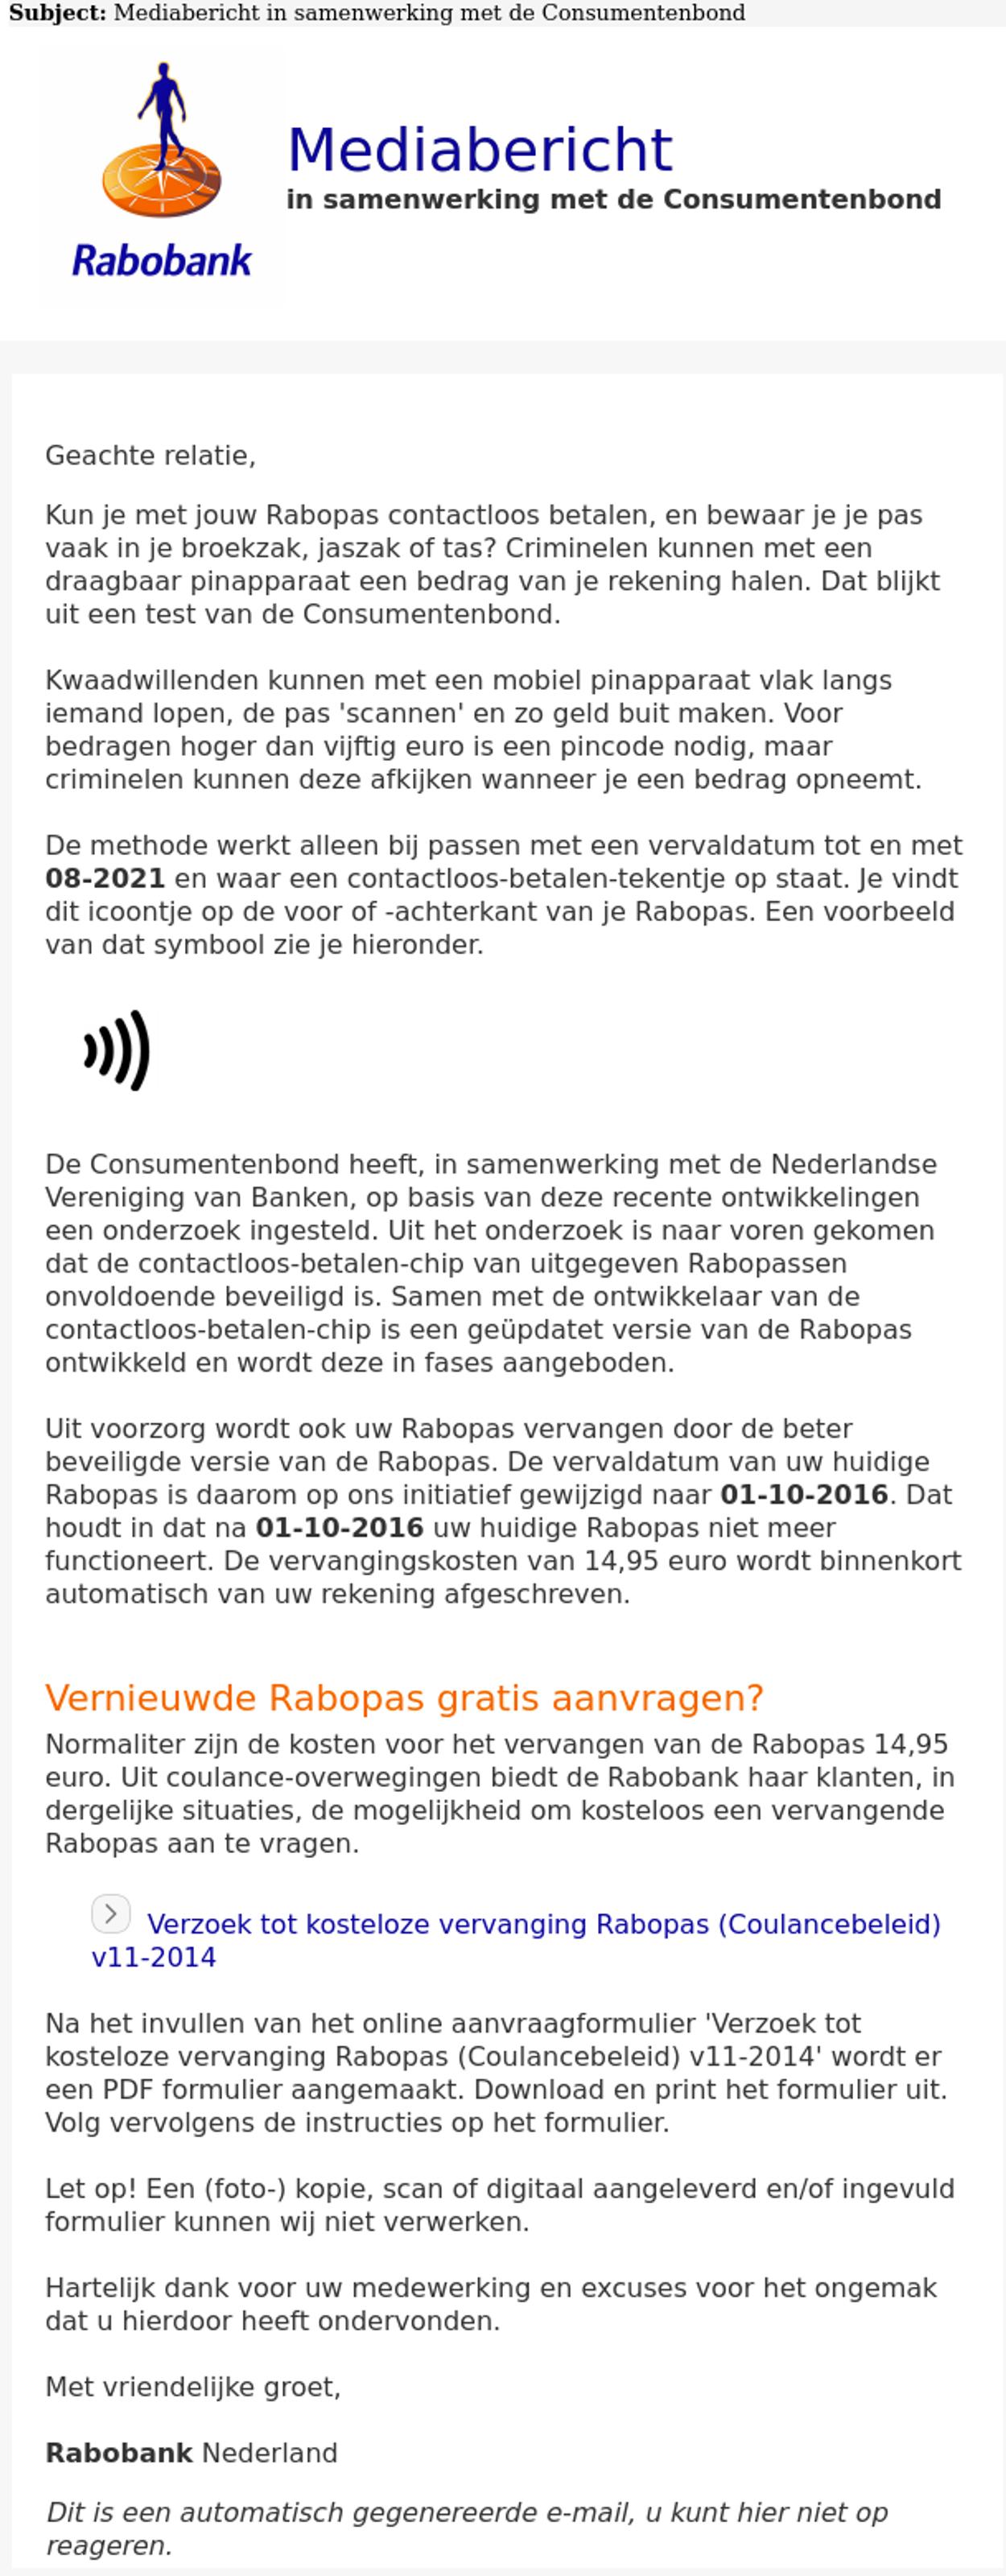 Nepmail Rabobank Consumentenbond